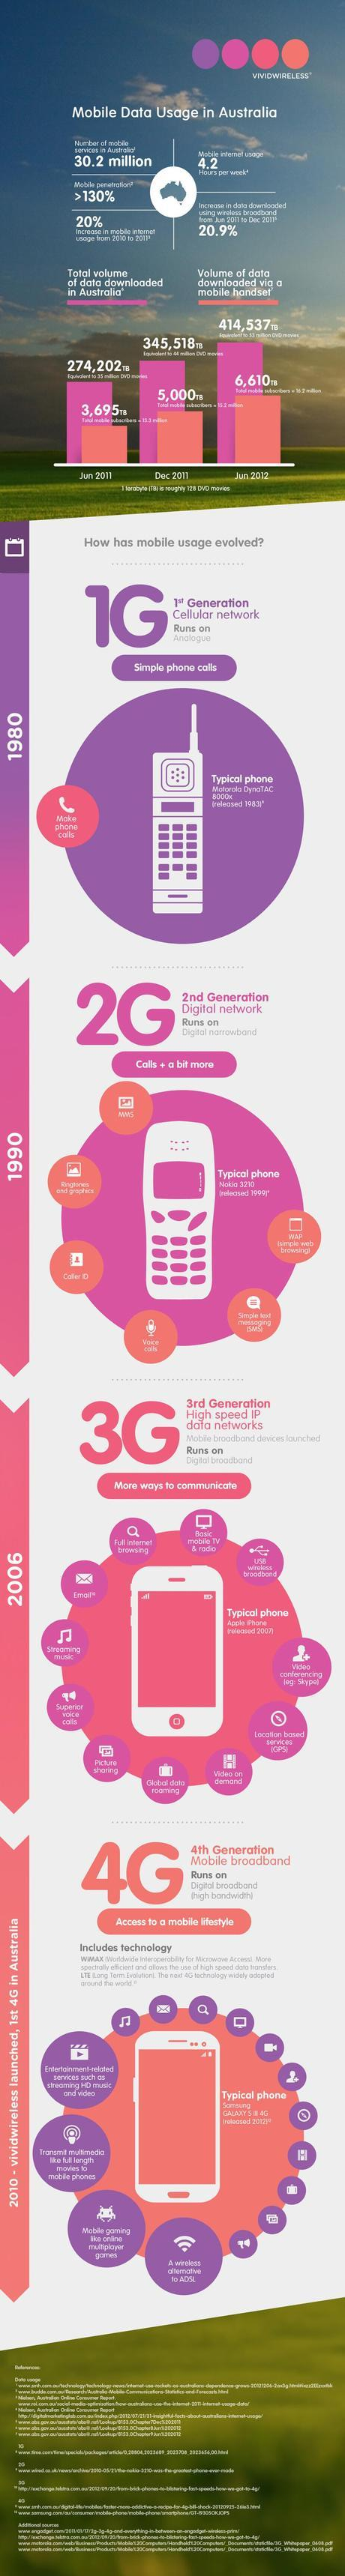 Australian Mobile Data Usage Infographic